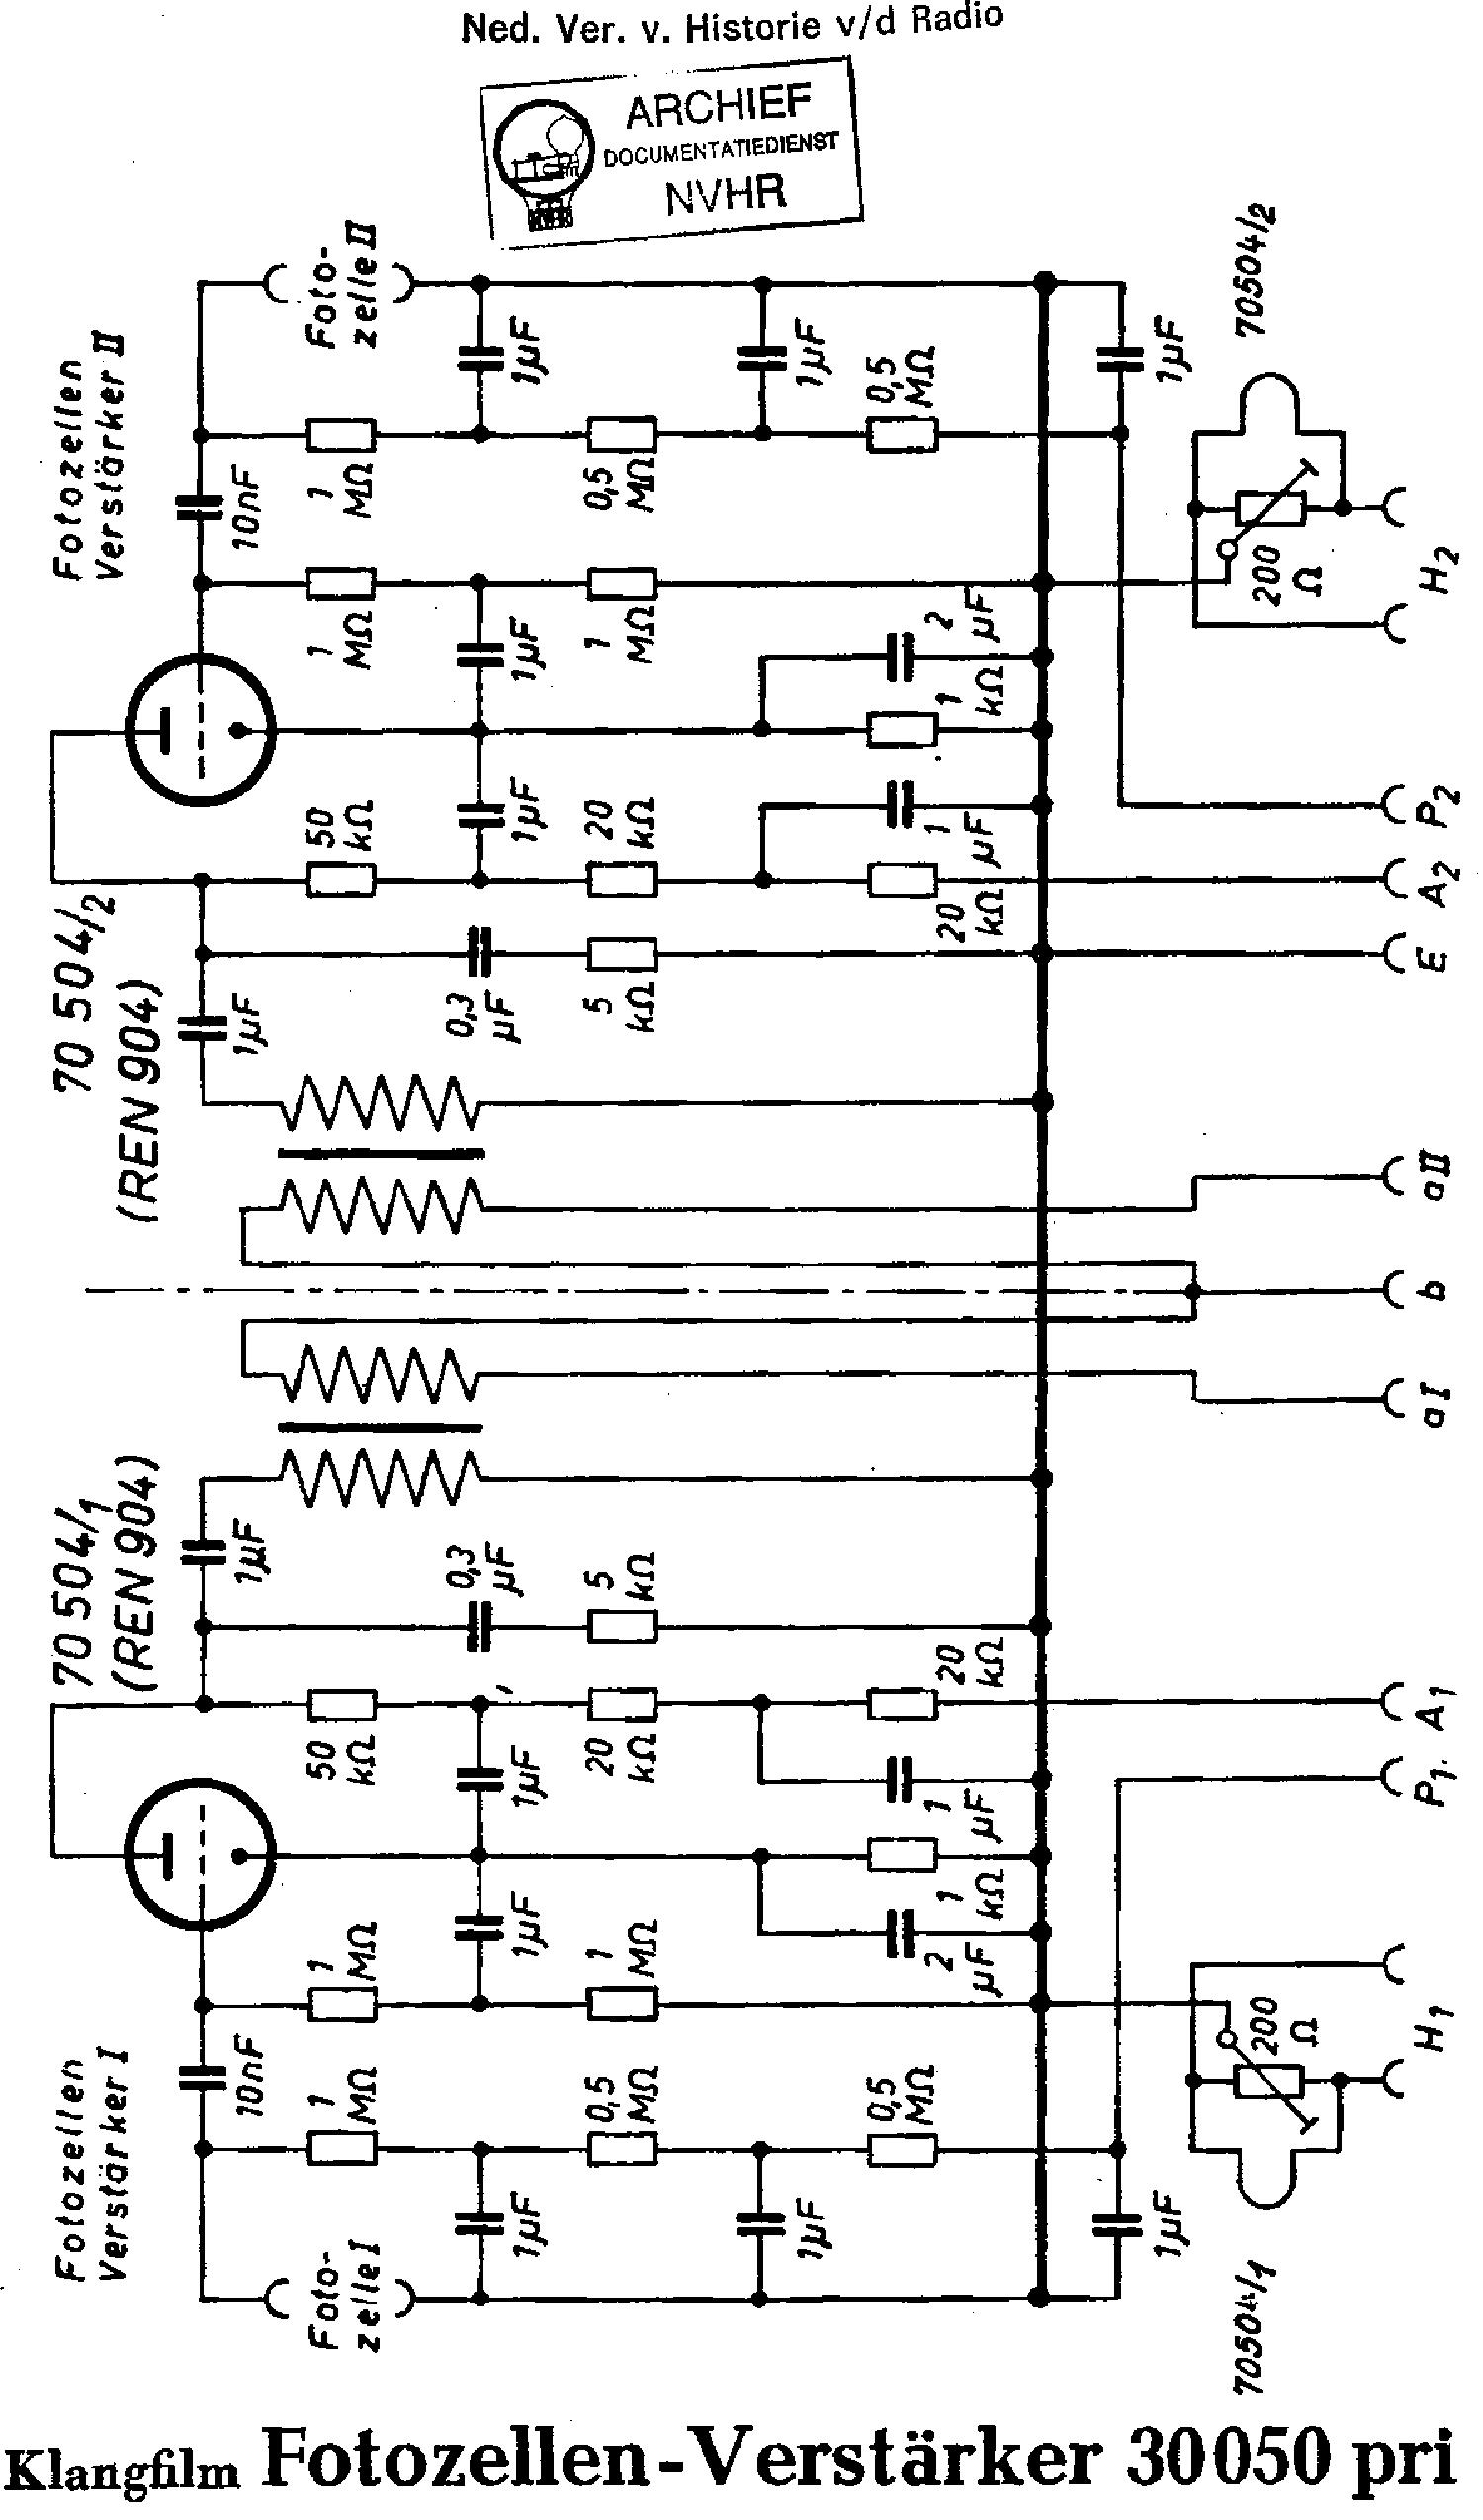 Klangfilm 34600 Biokin Amplifier Sch Service Manual Download Photocells Amplifiers Circuit Schematic Diagram 30050 Photocell